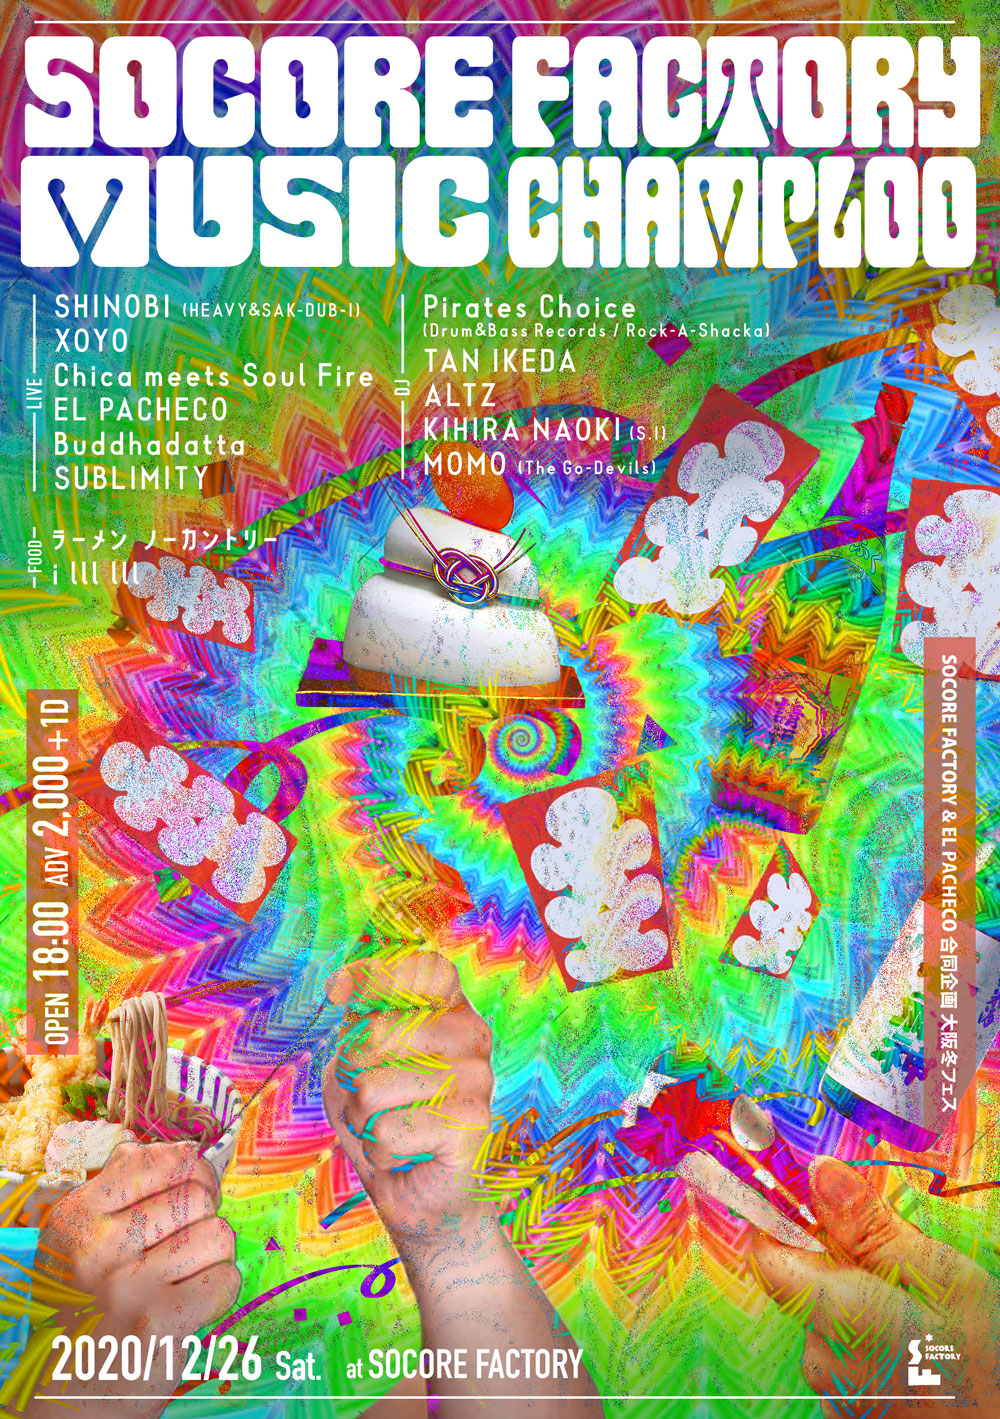 20.12.26(Sat)SOCORE FACTORY MUSIC CHAMPLOO vol.3